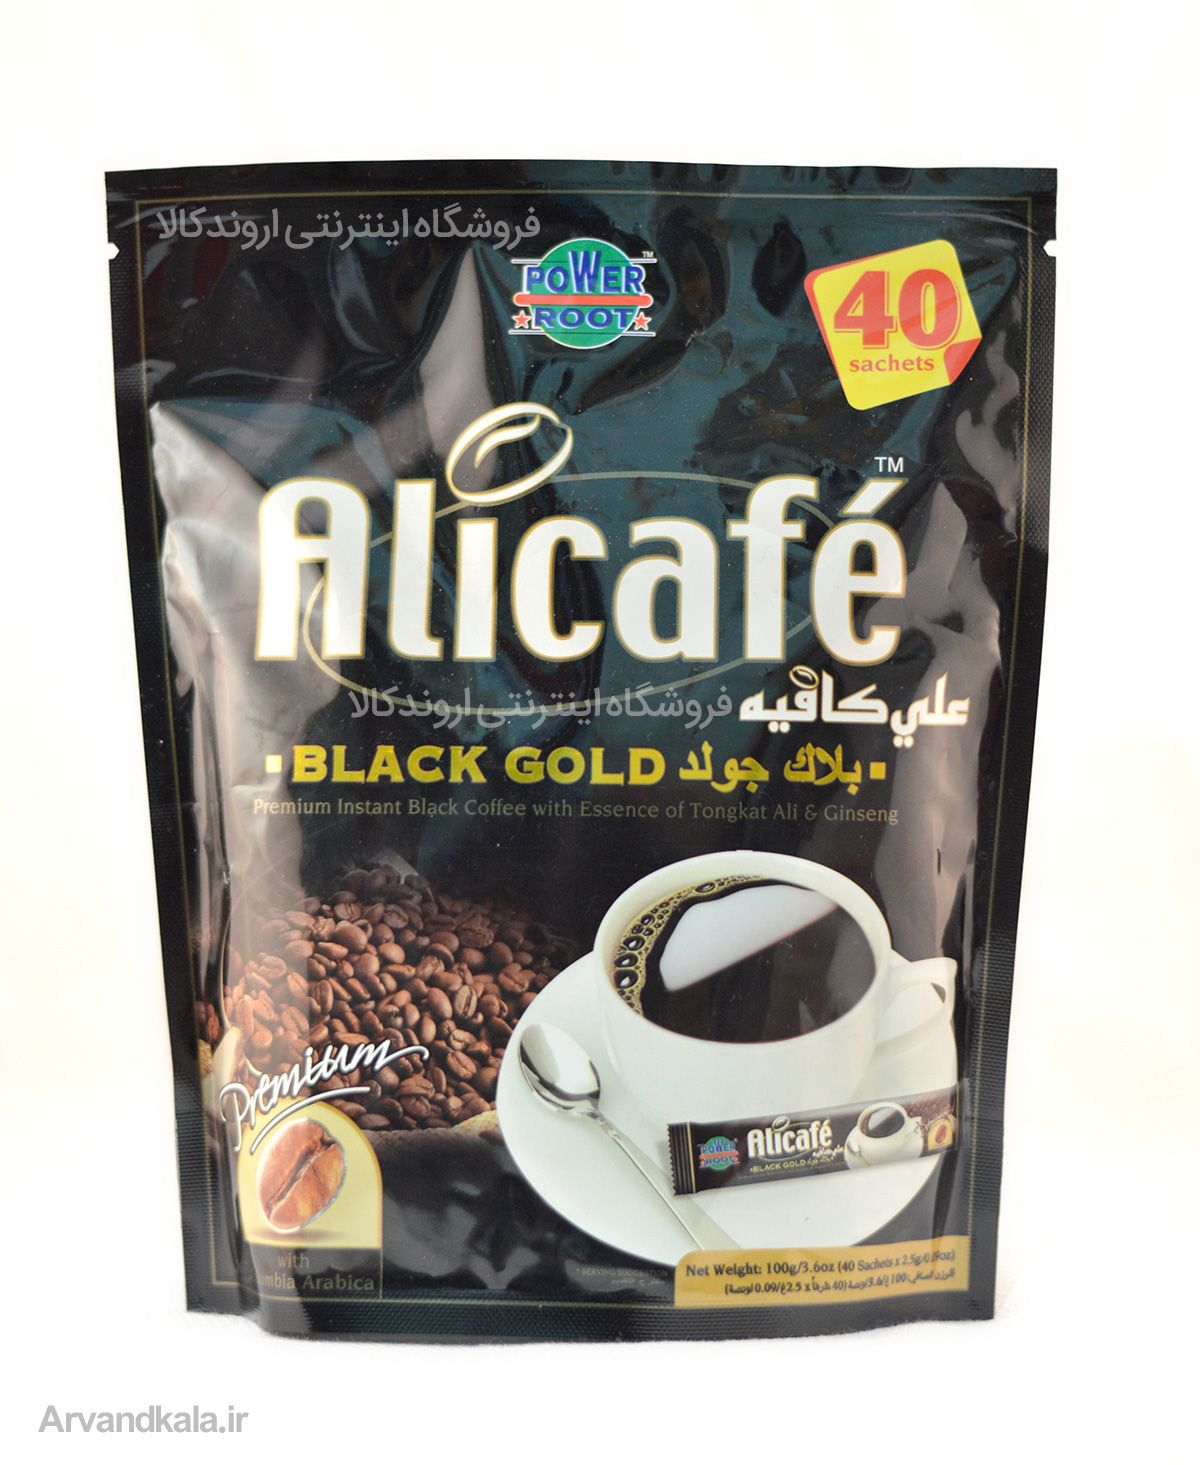 علی کافه مدل Black Gold Black Coffee Sachet Chip Bag